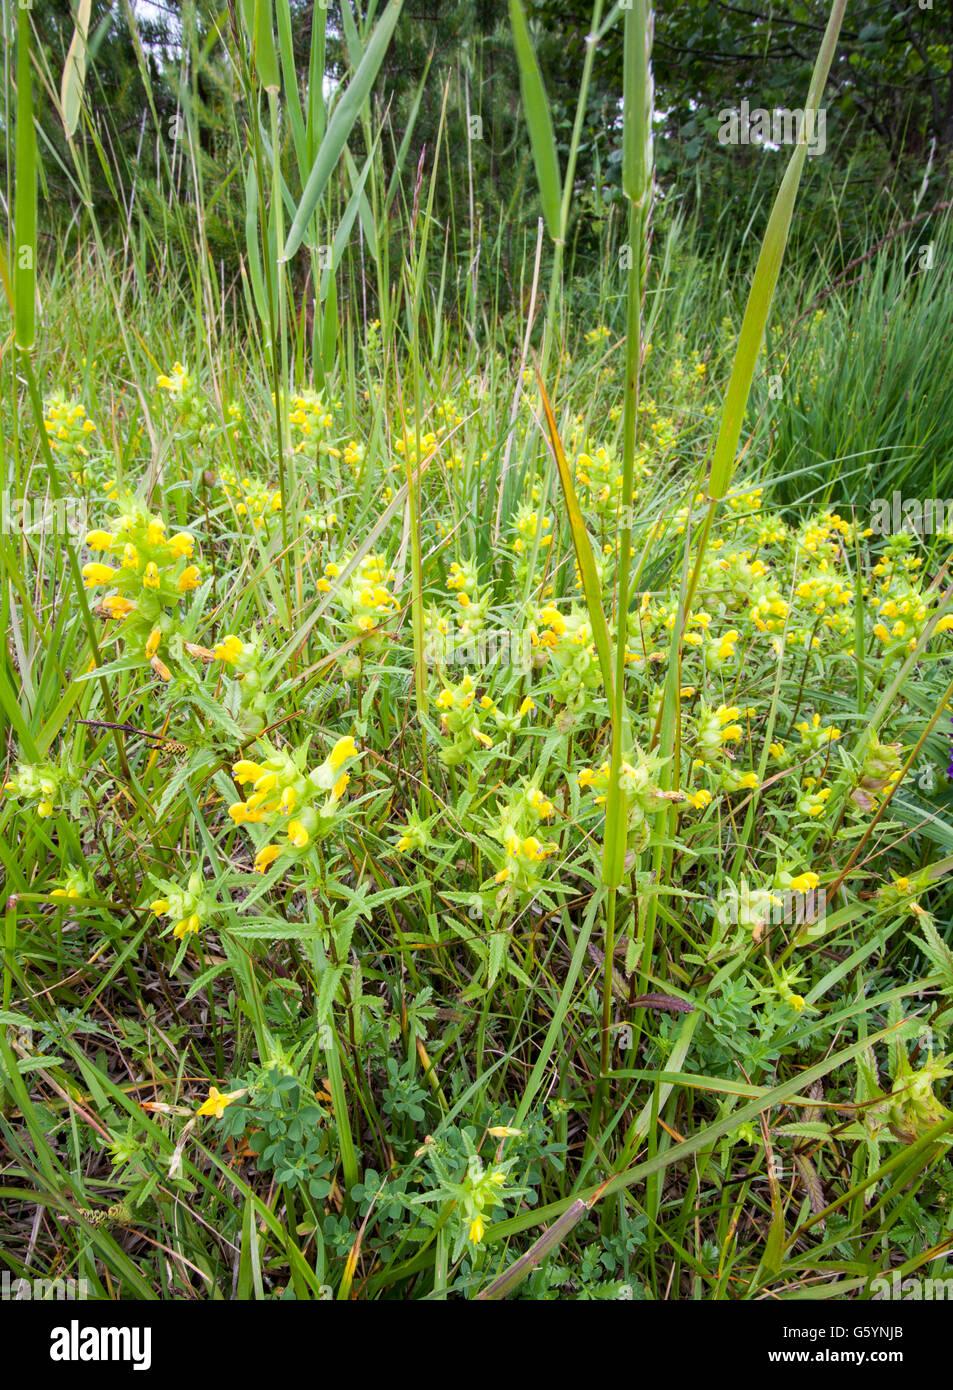 Greater Yellow-rattle (Rhinanthus angustifolius) - Stock Image